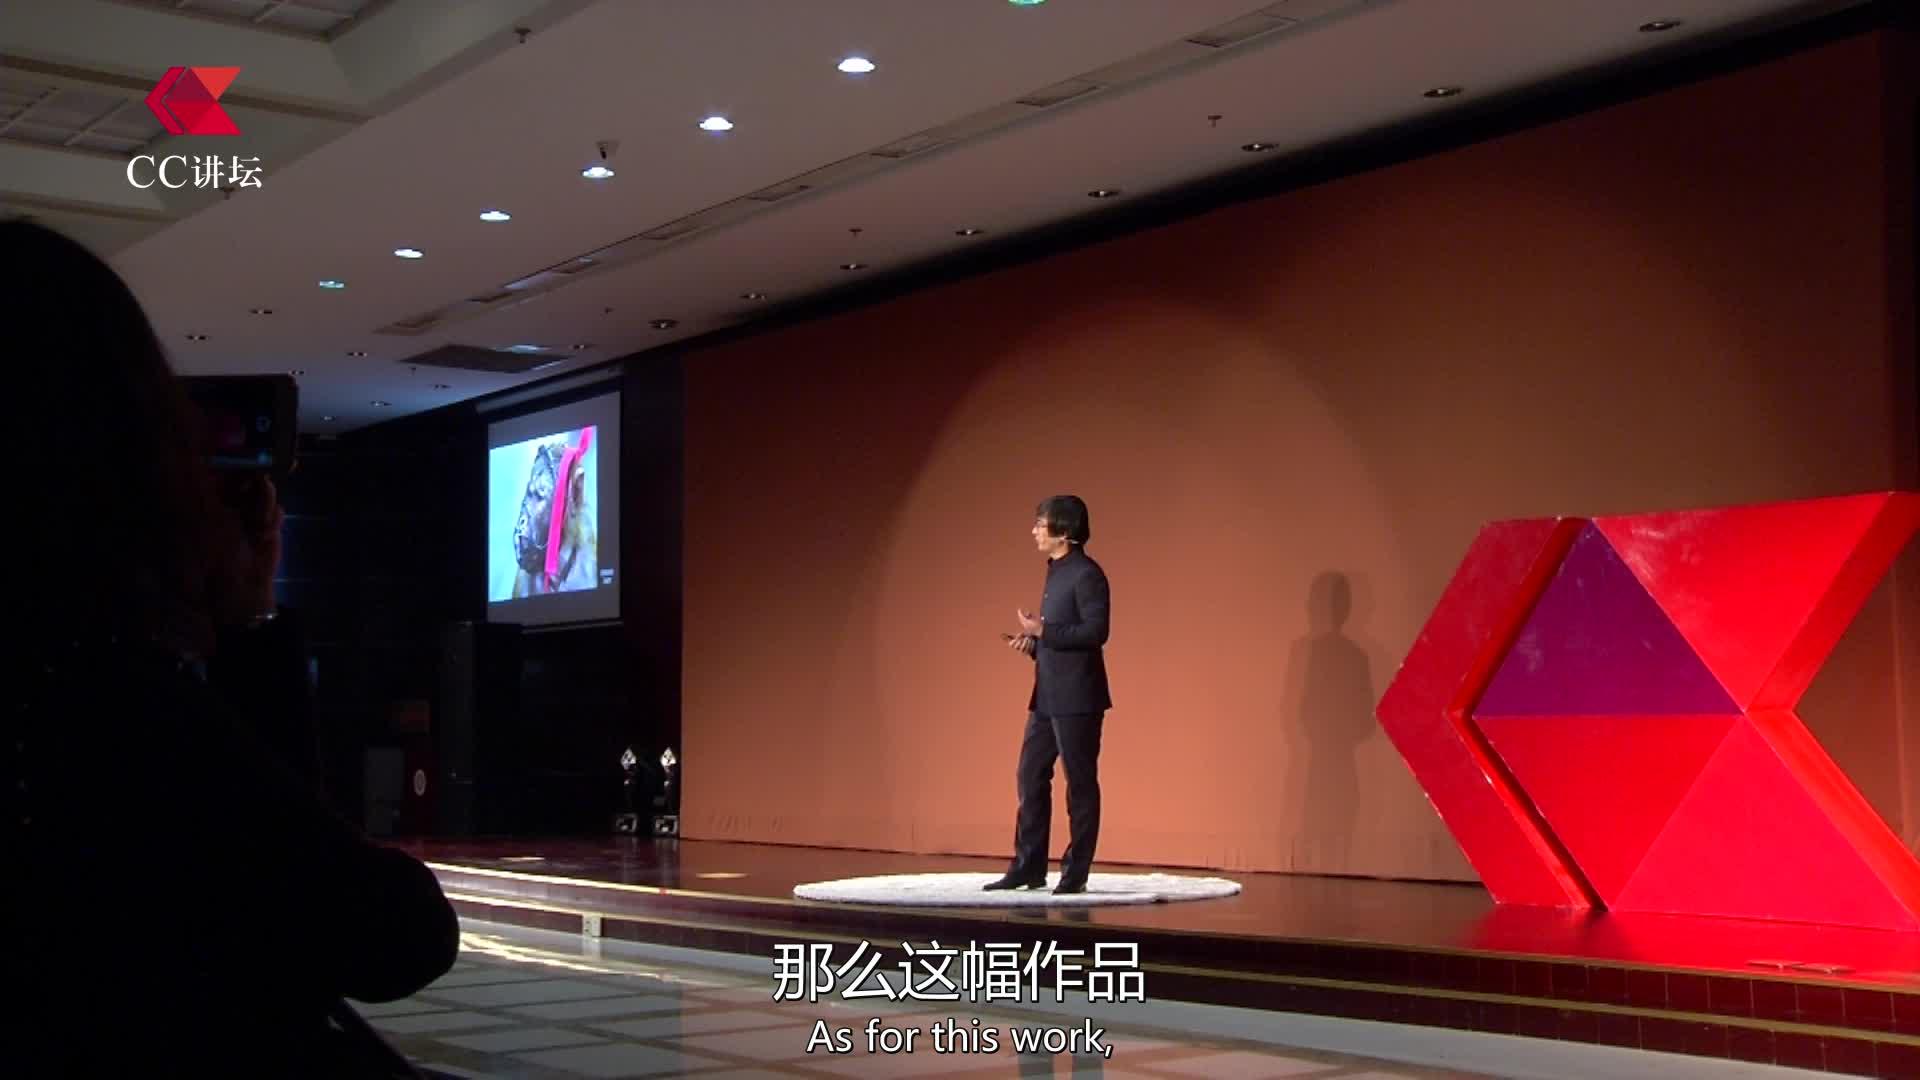 CC讲坛——董长军:生态摄影的呐喊